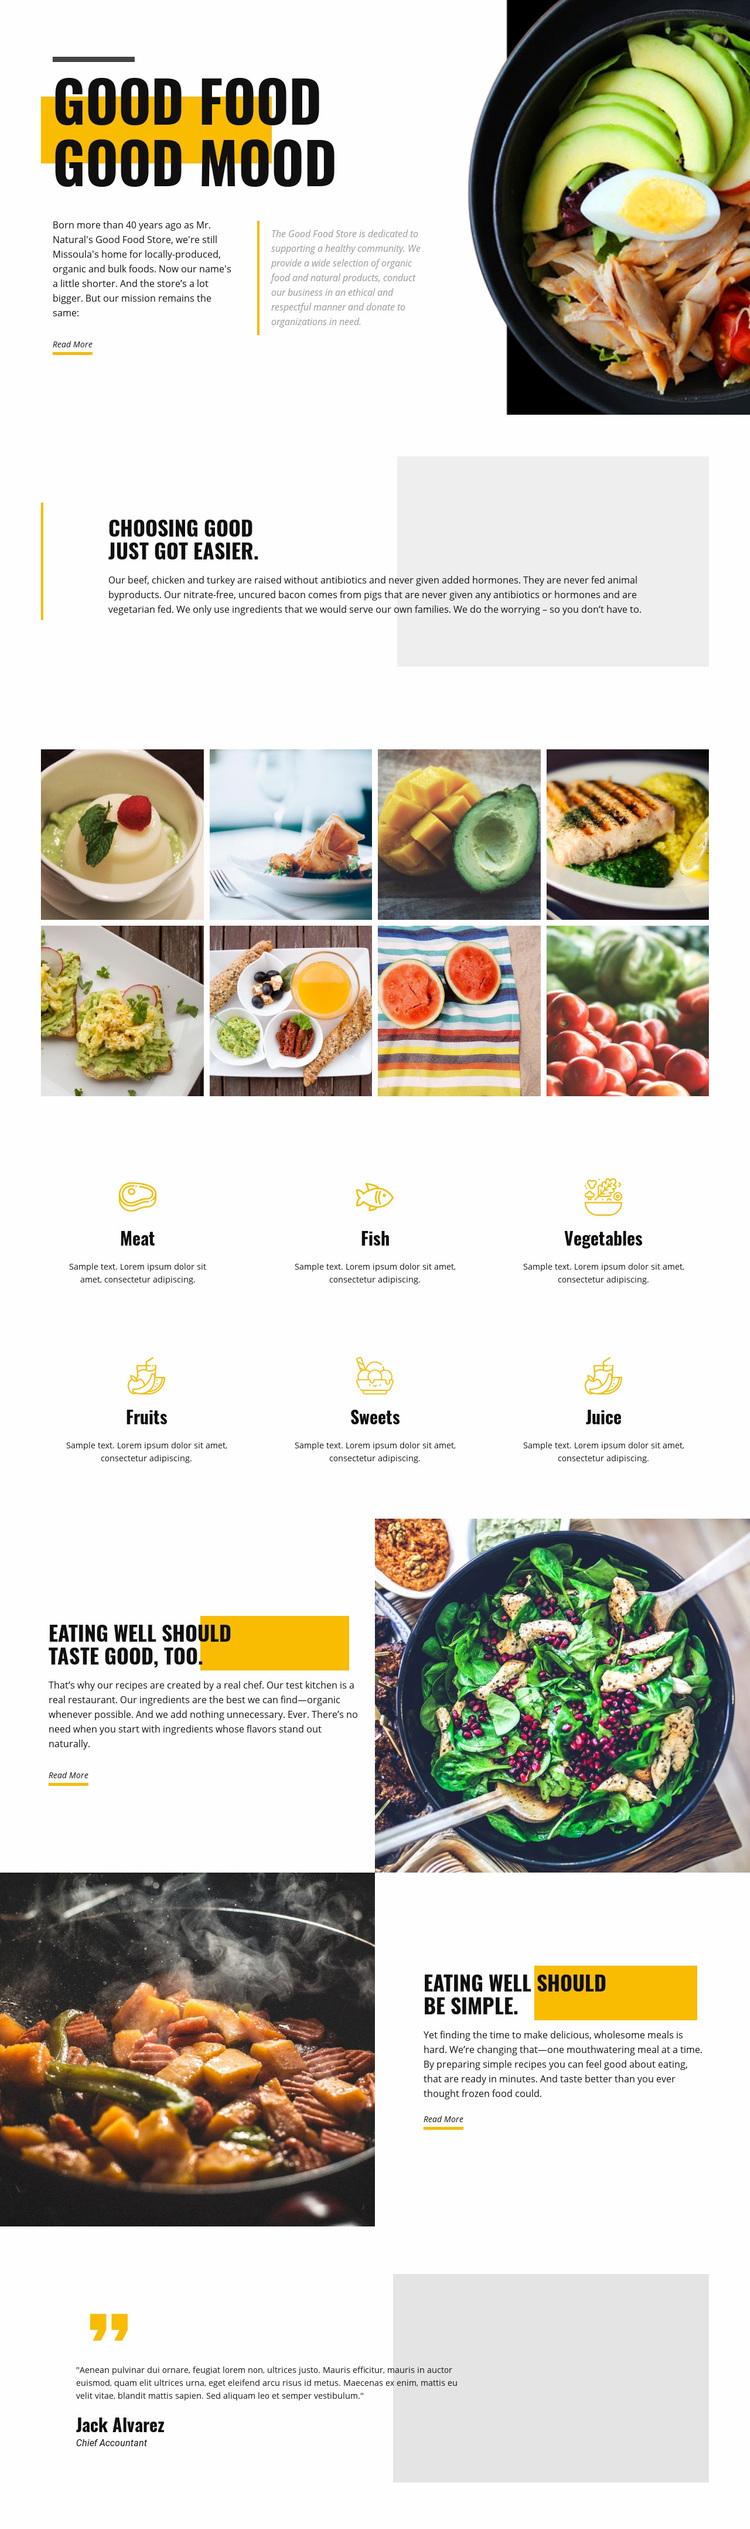 Good mood good food Web Page Designer